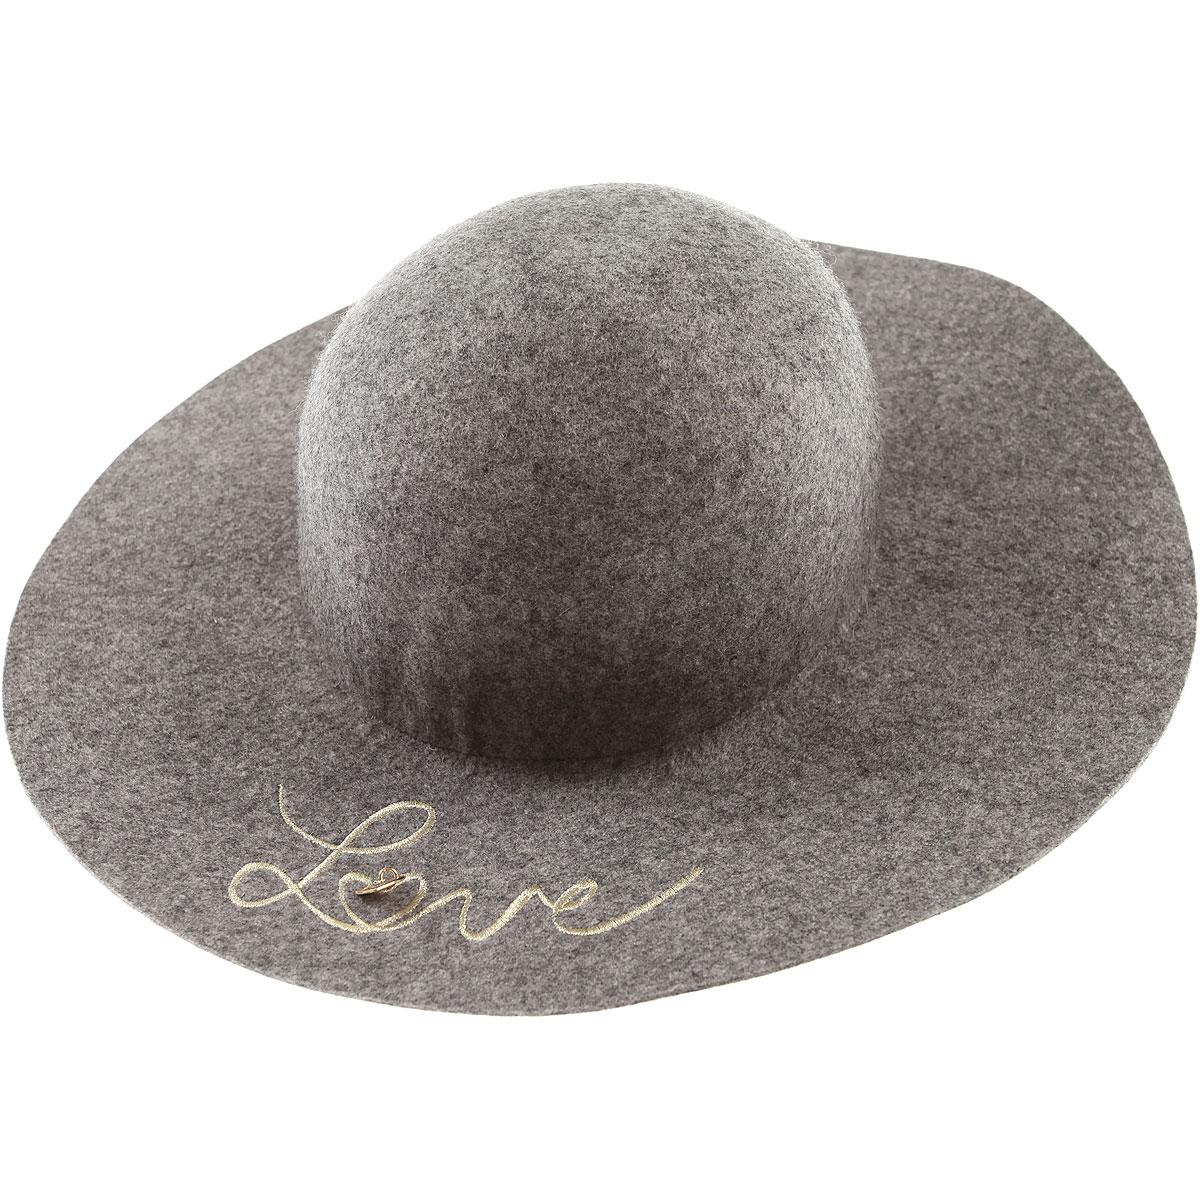 Image of Chloe Kids Hats for Girls, Grey, Wool, 2017, 58 56